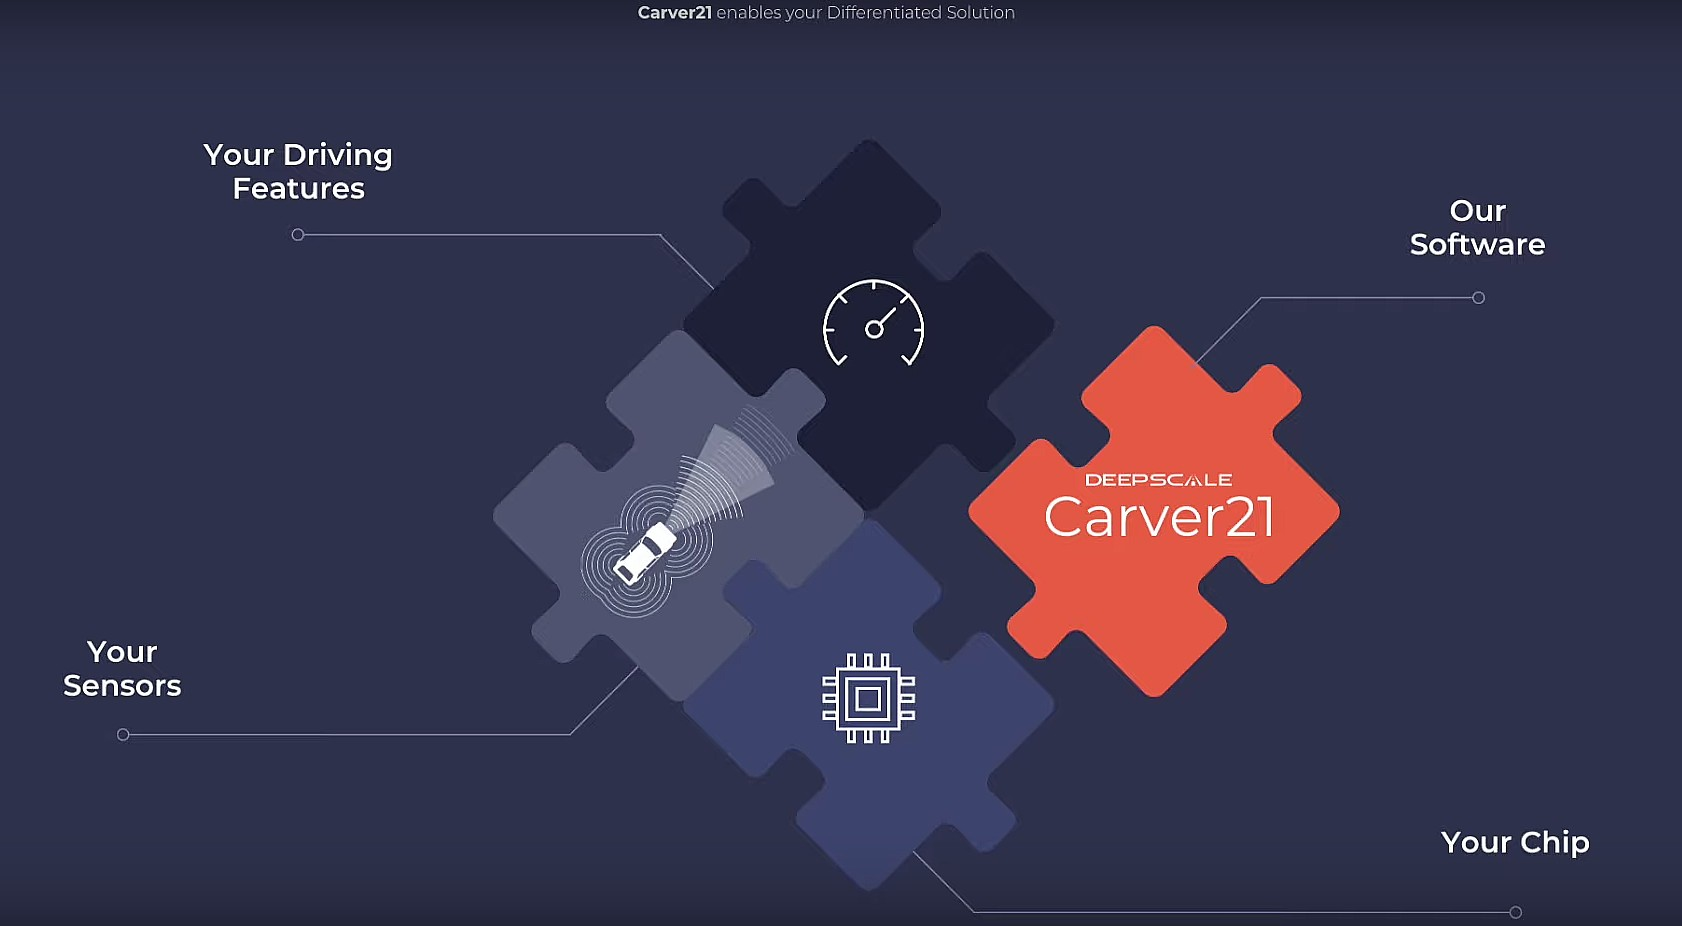 deepscale-carver21